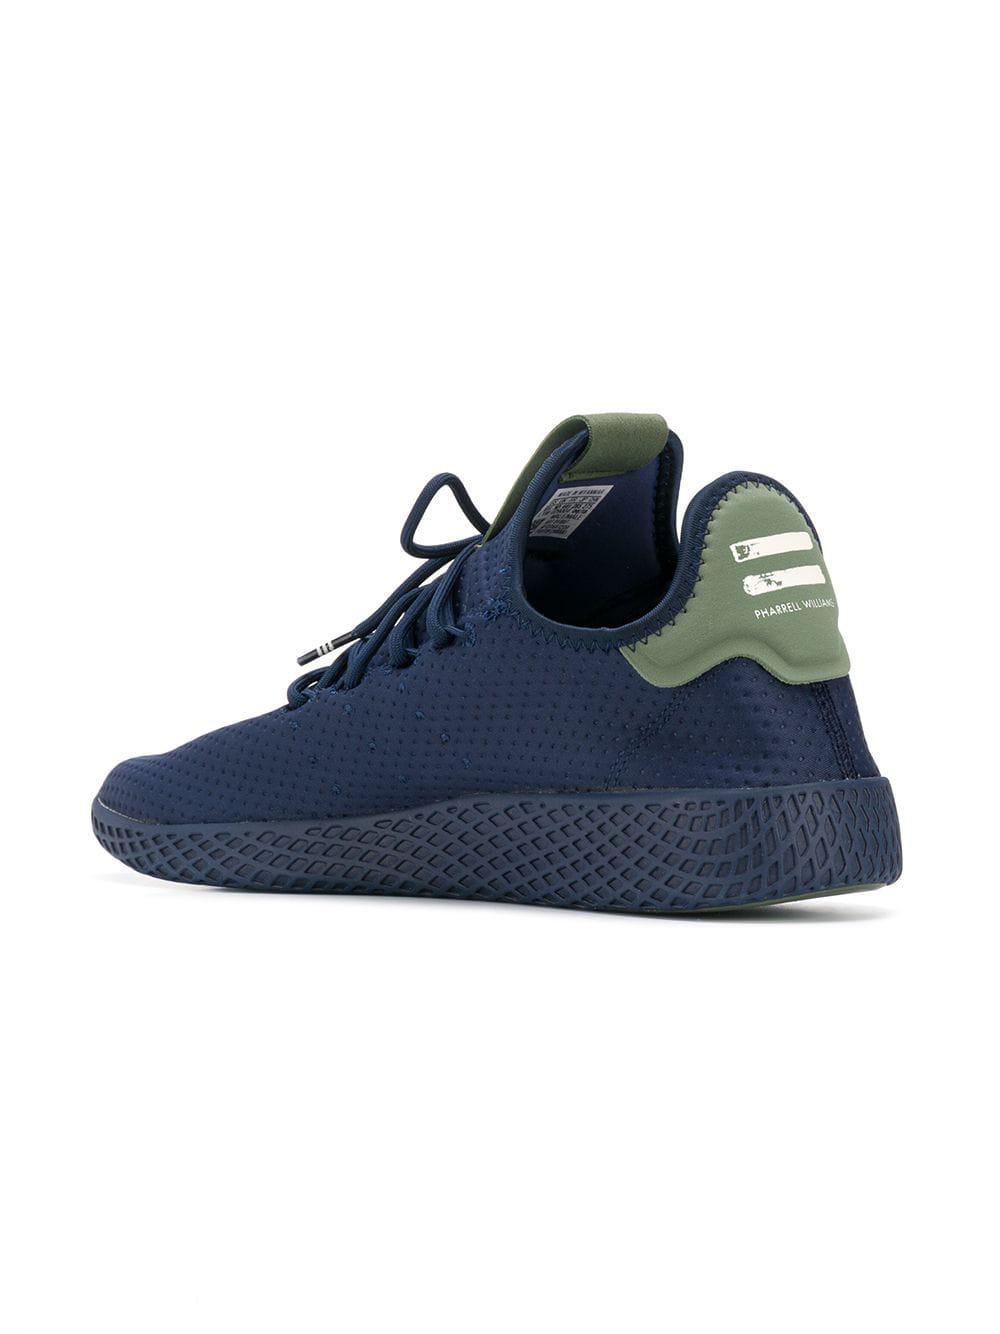 Adidas Originals - Blue X Pharrell Williams Tennis Hu Sneakers for Men -  Lyst. View fullscreen 40836092c02